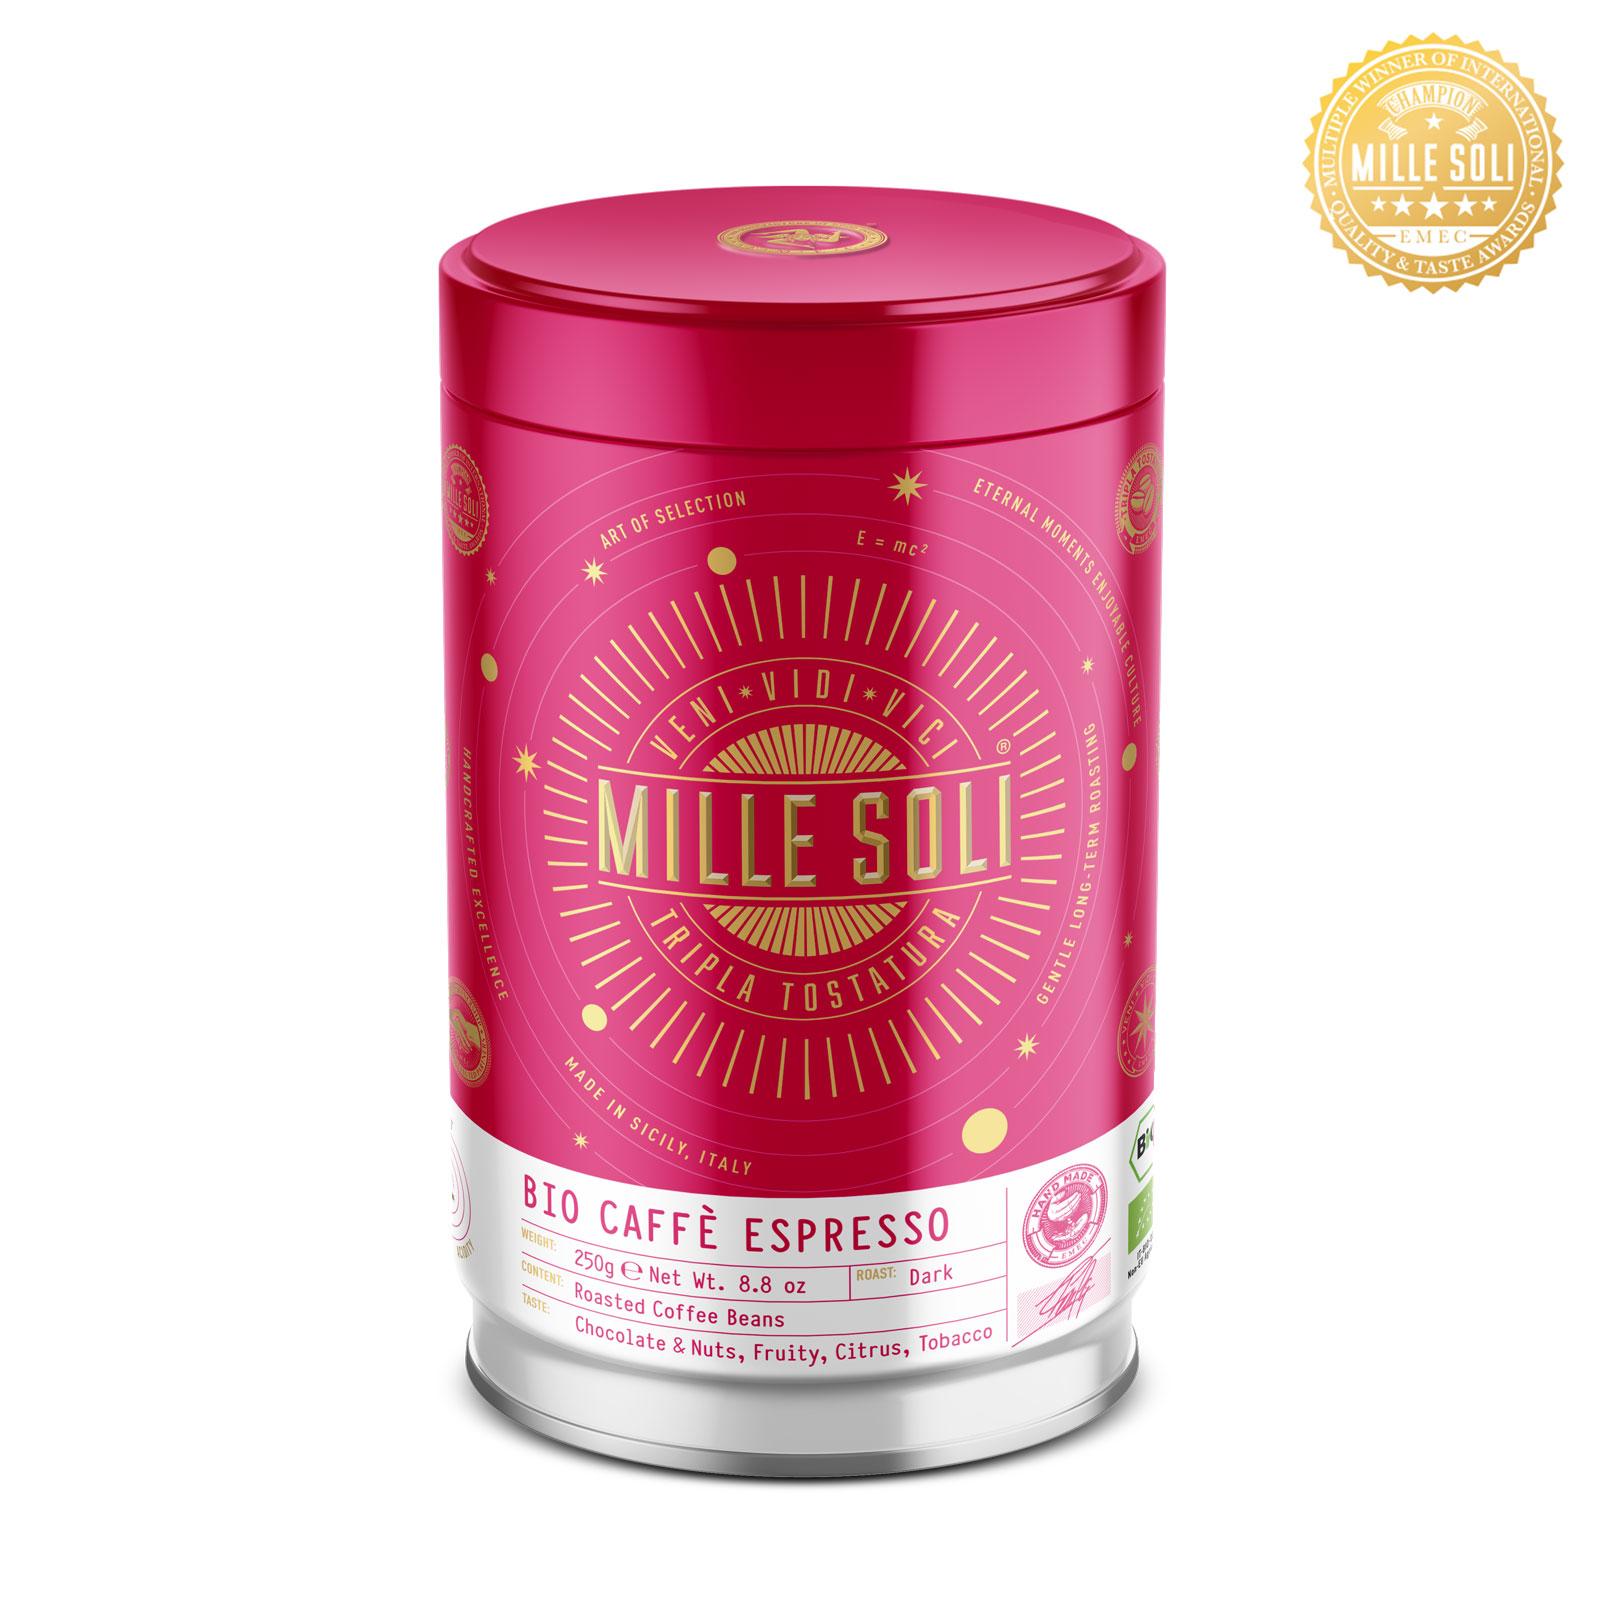 MILLE SOLI - BIO Caffè Espresso - 250g - Bohnen